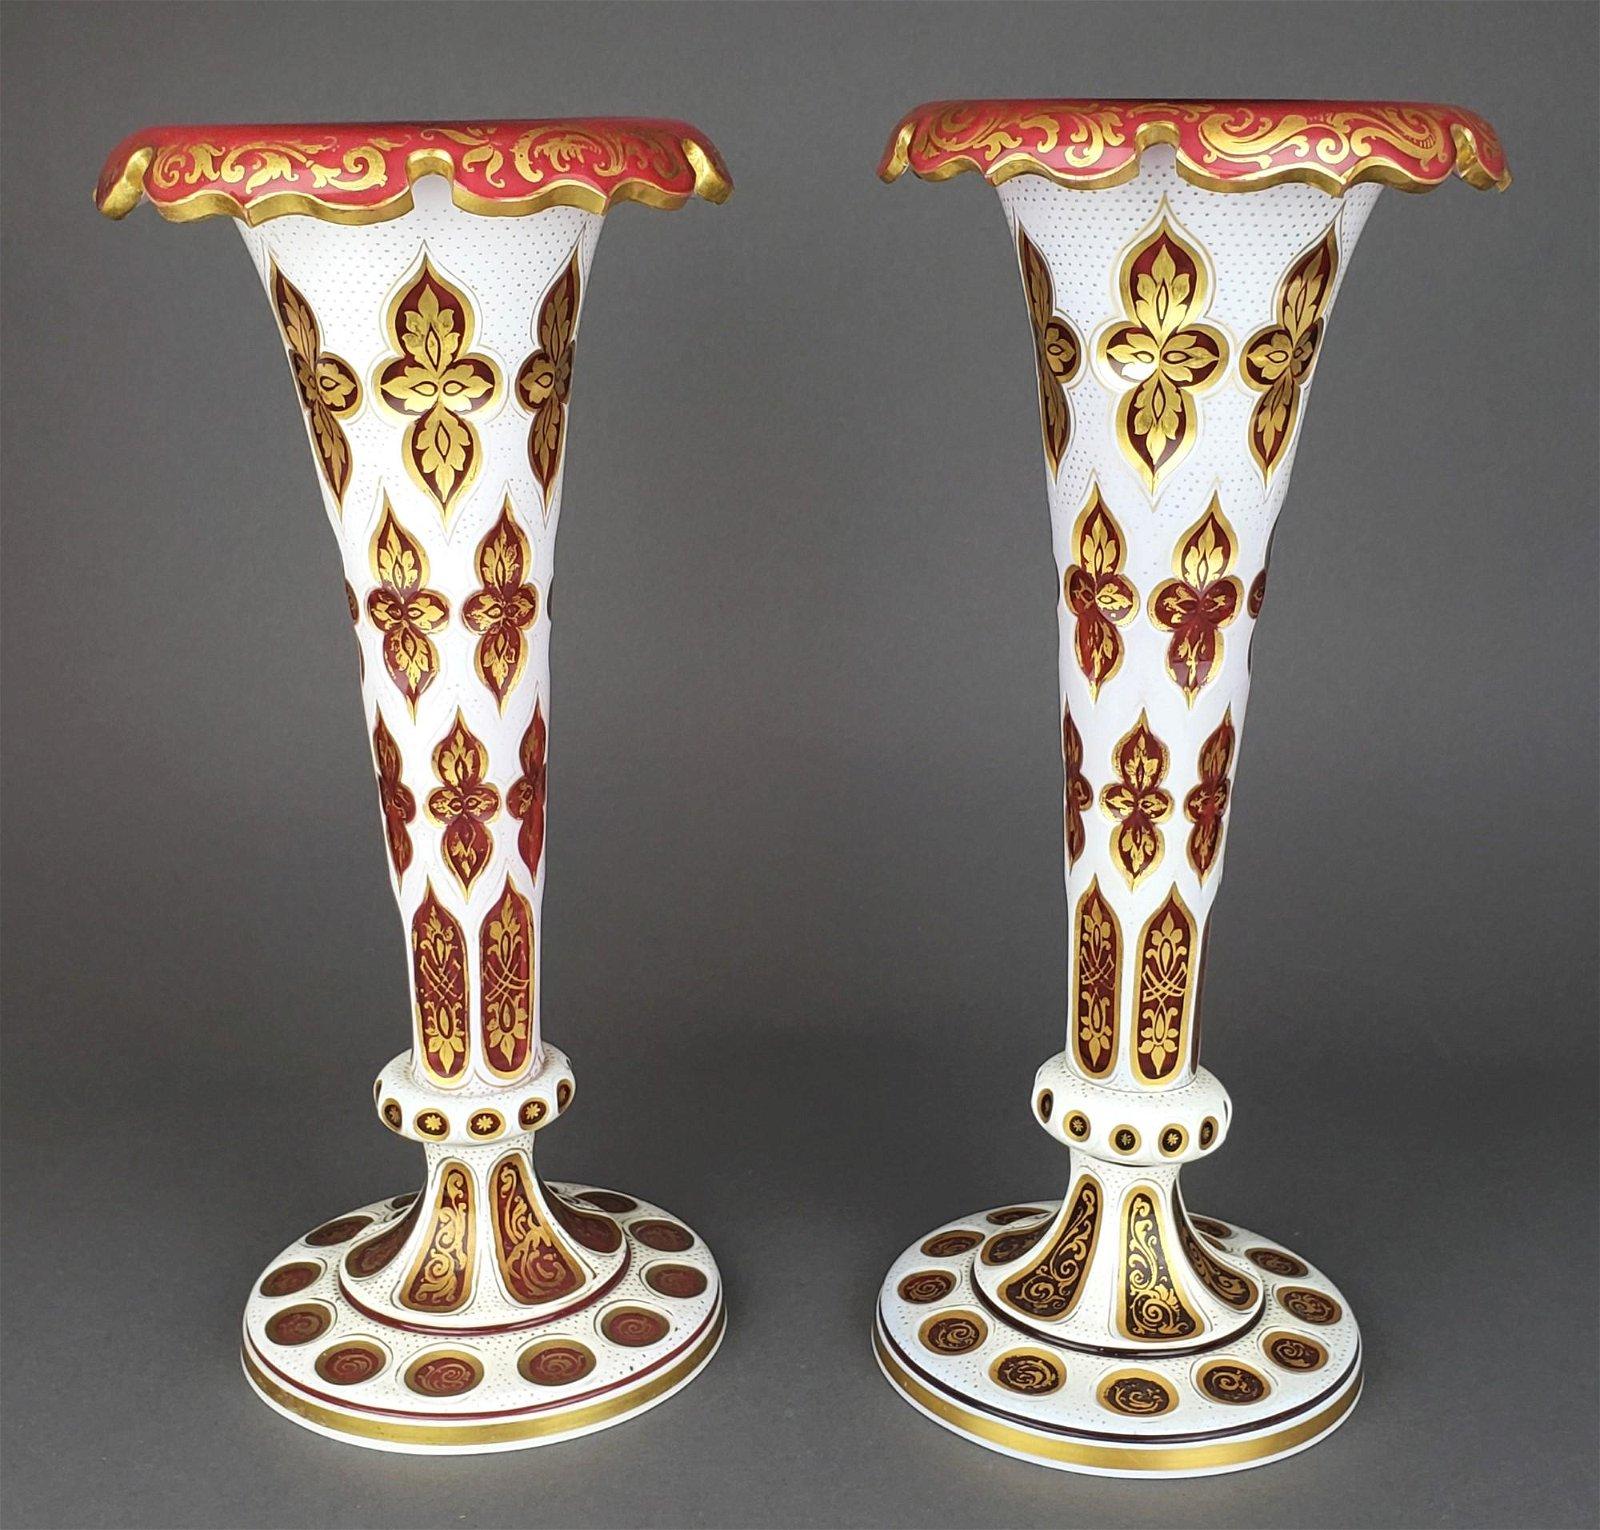 Pair of Large 19th C. Bohemian Vases